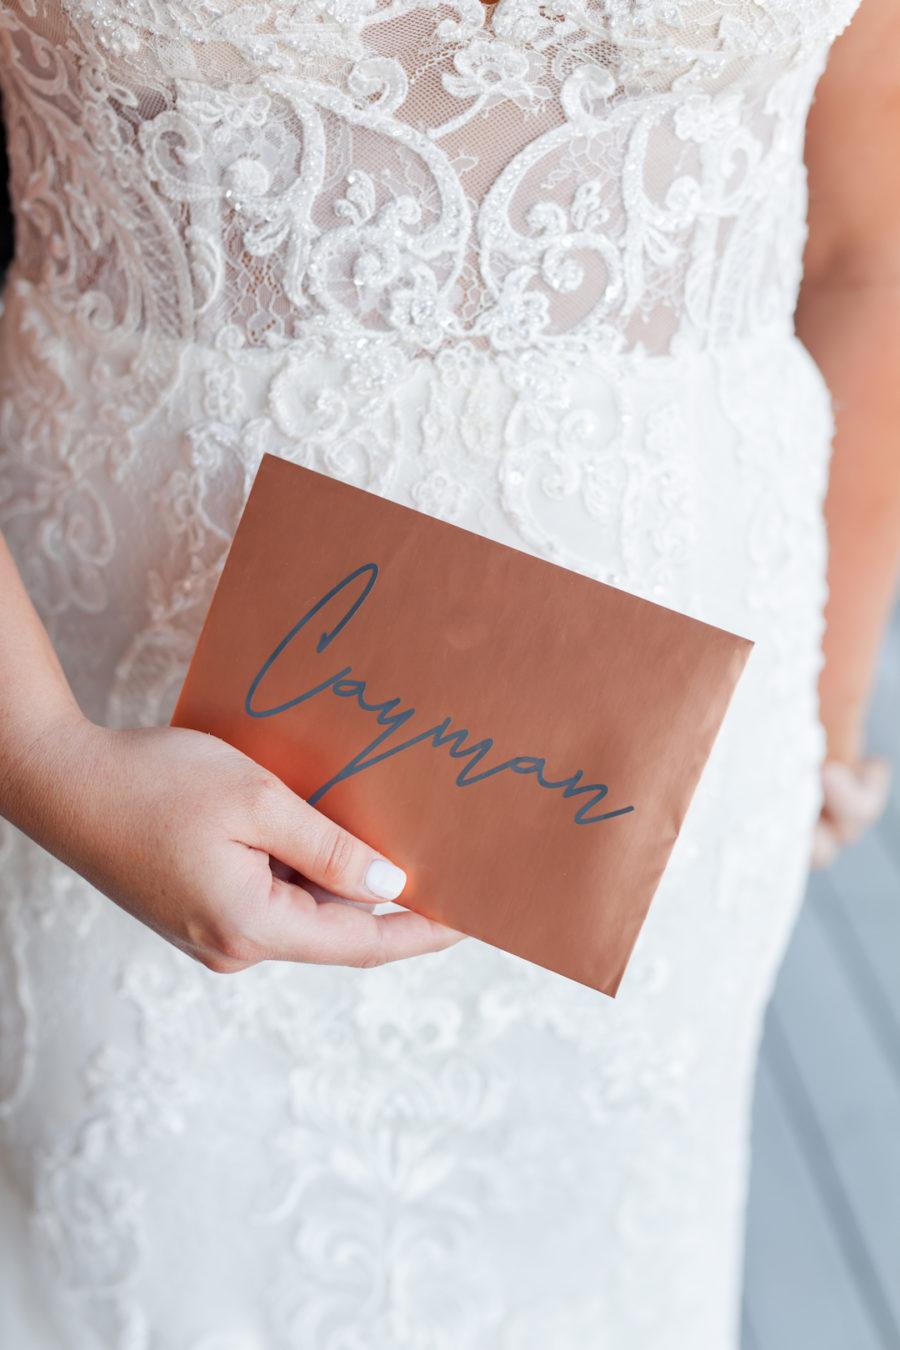 Romantic Blush & Metallic Wedding at Depot Square featured on Nashville Bride Guide